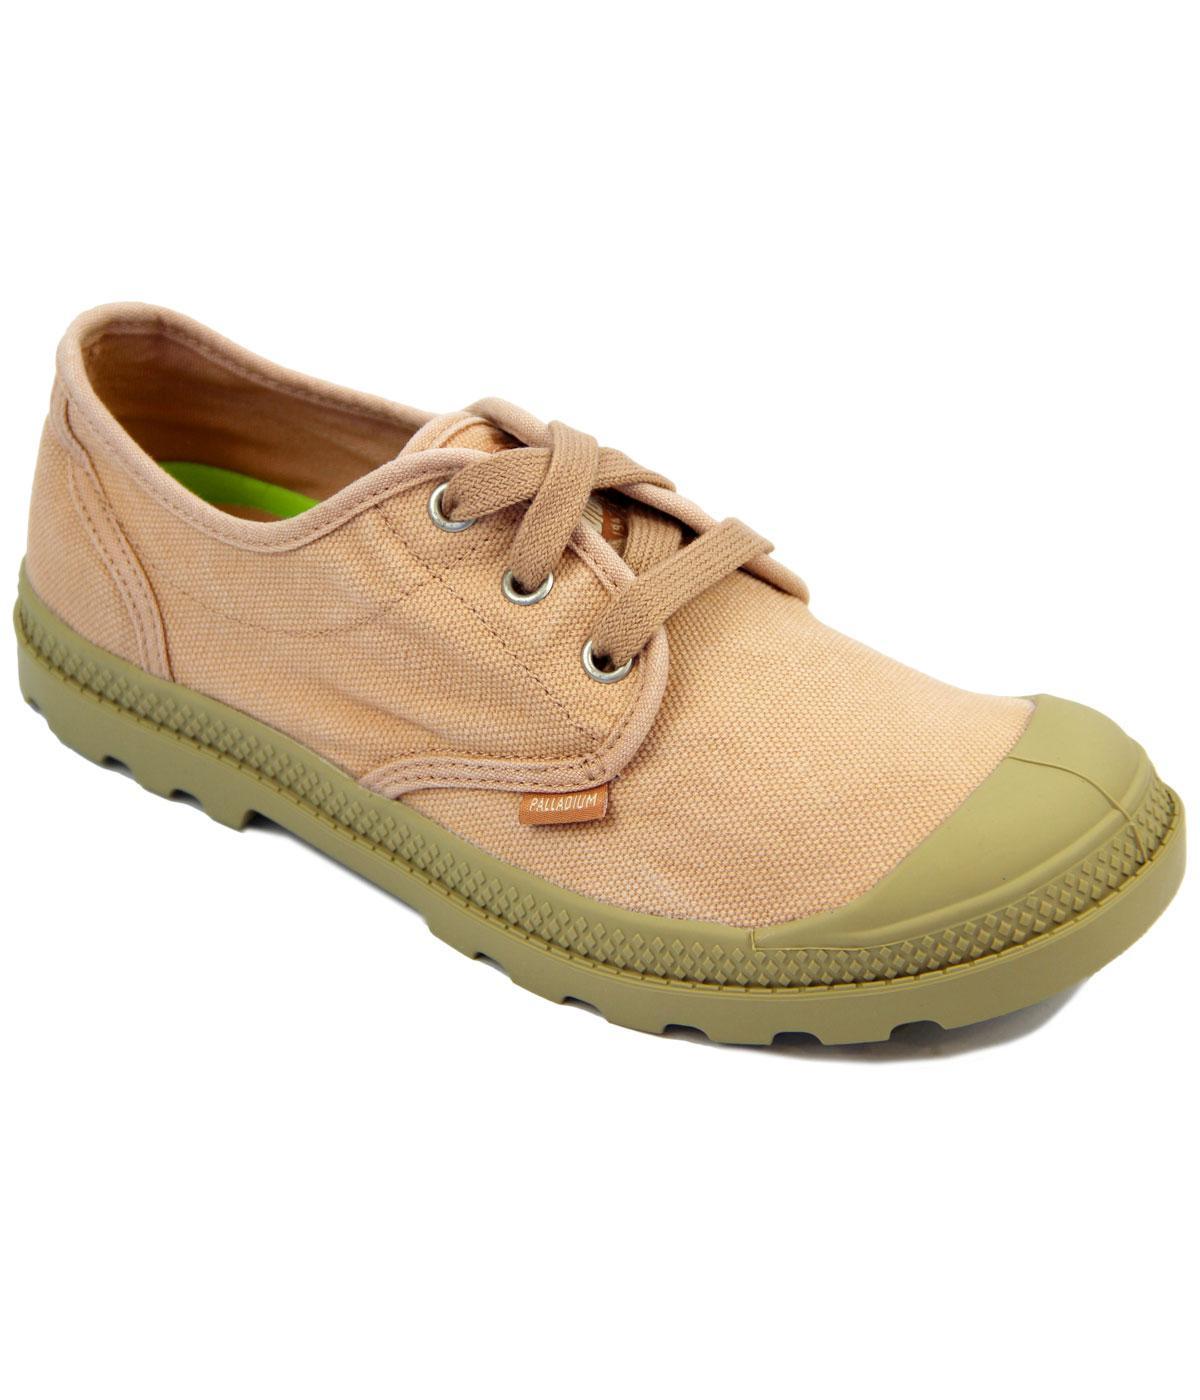 Pampa Oxford PALLADIUM Retro Canvas Shoes (S/P)